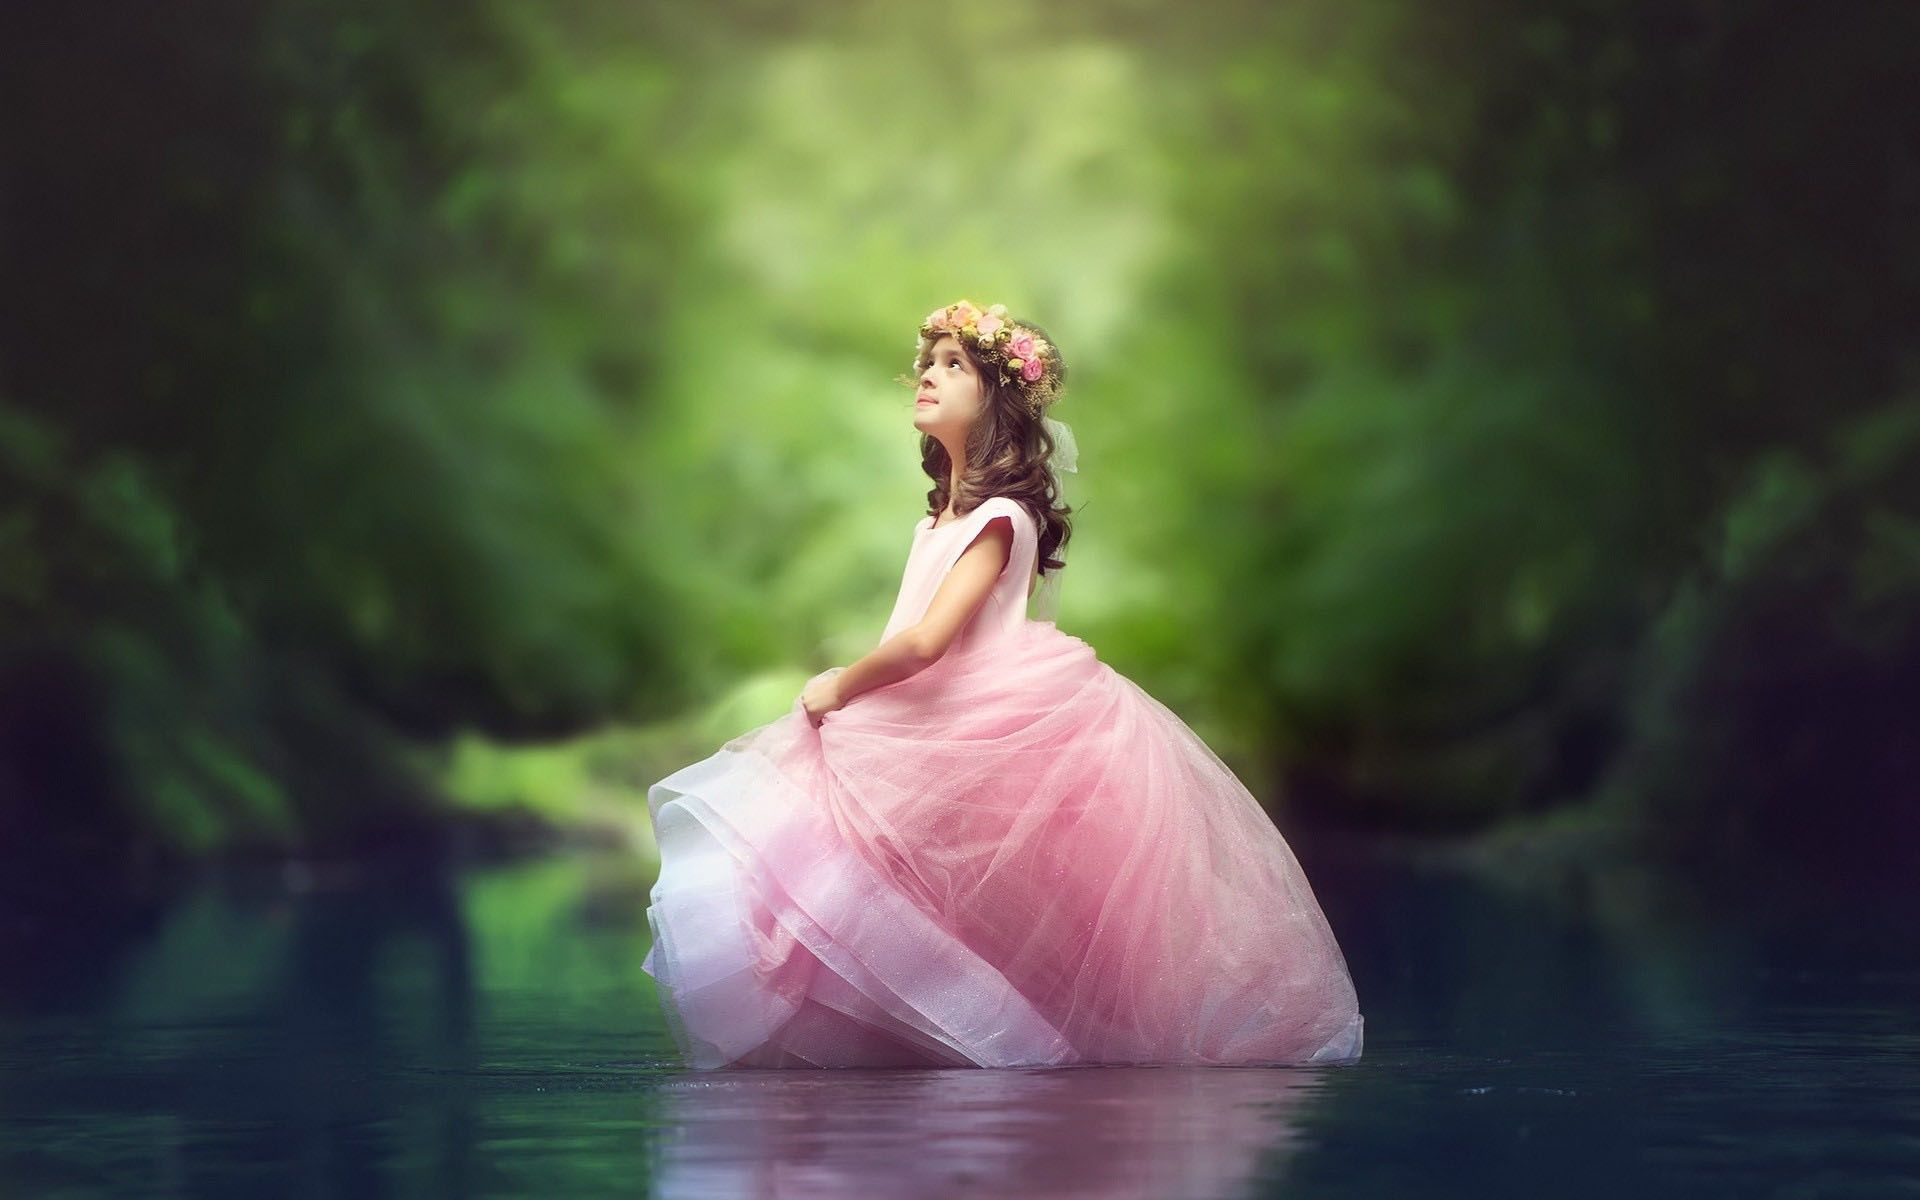 Little Princess Wallpapers Top Free Little Princess Backgrounds Wallpaperaccess